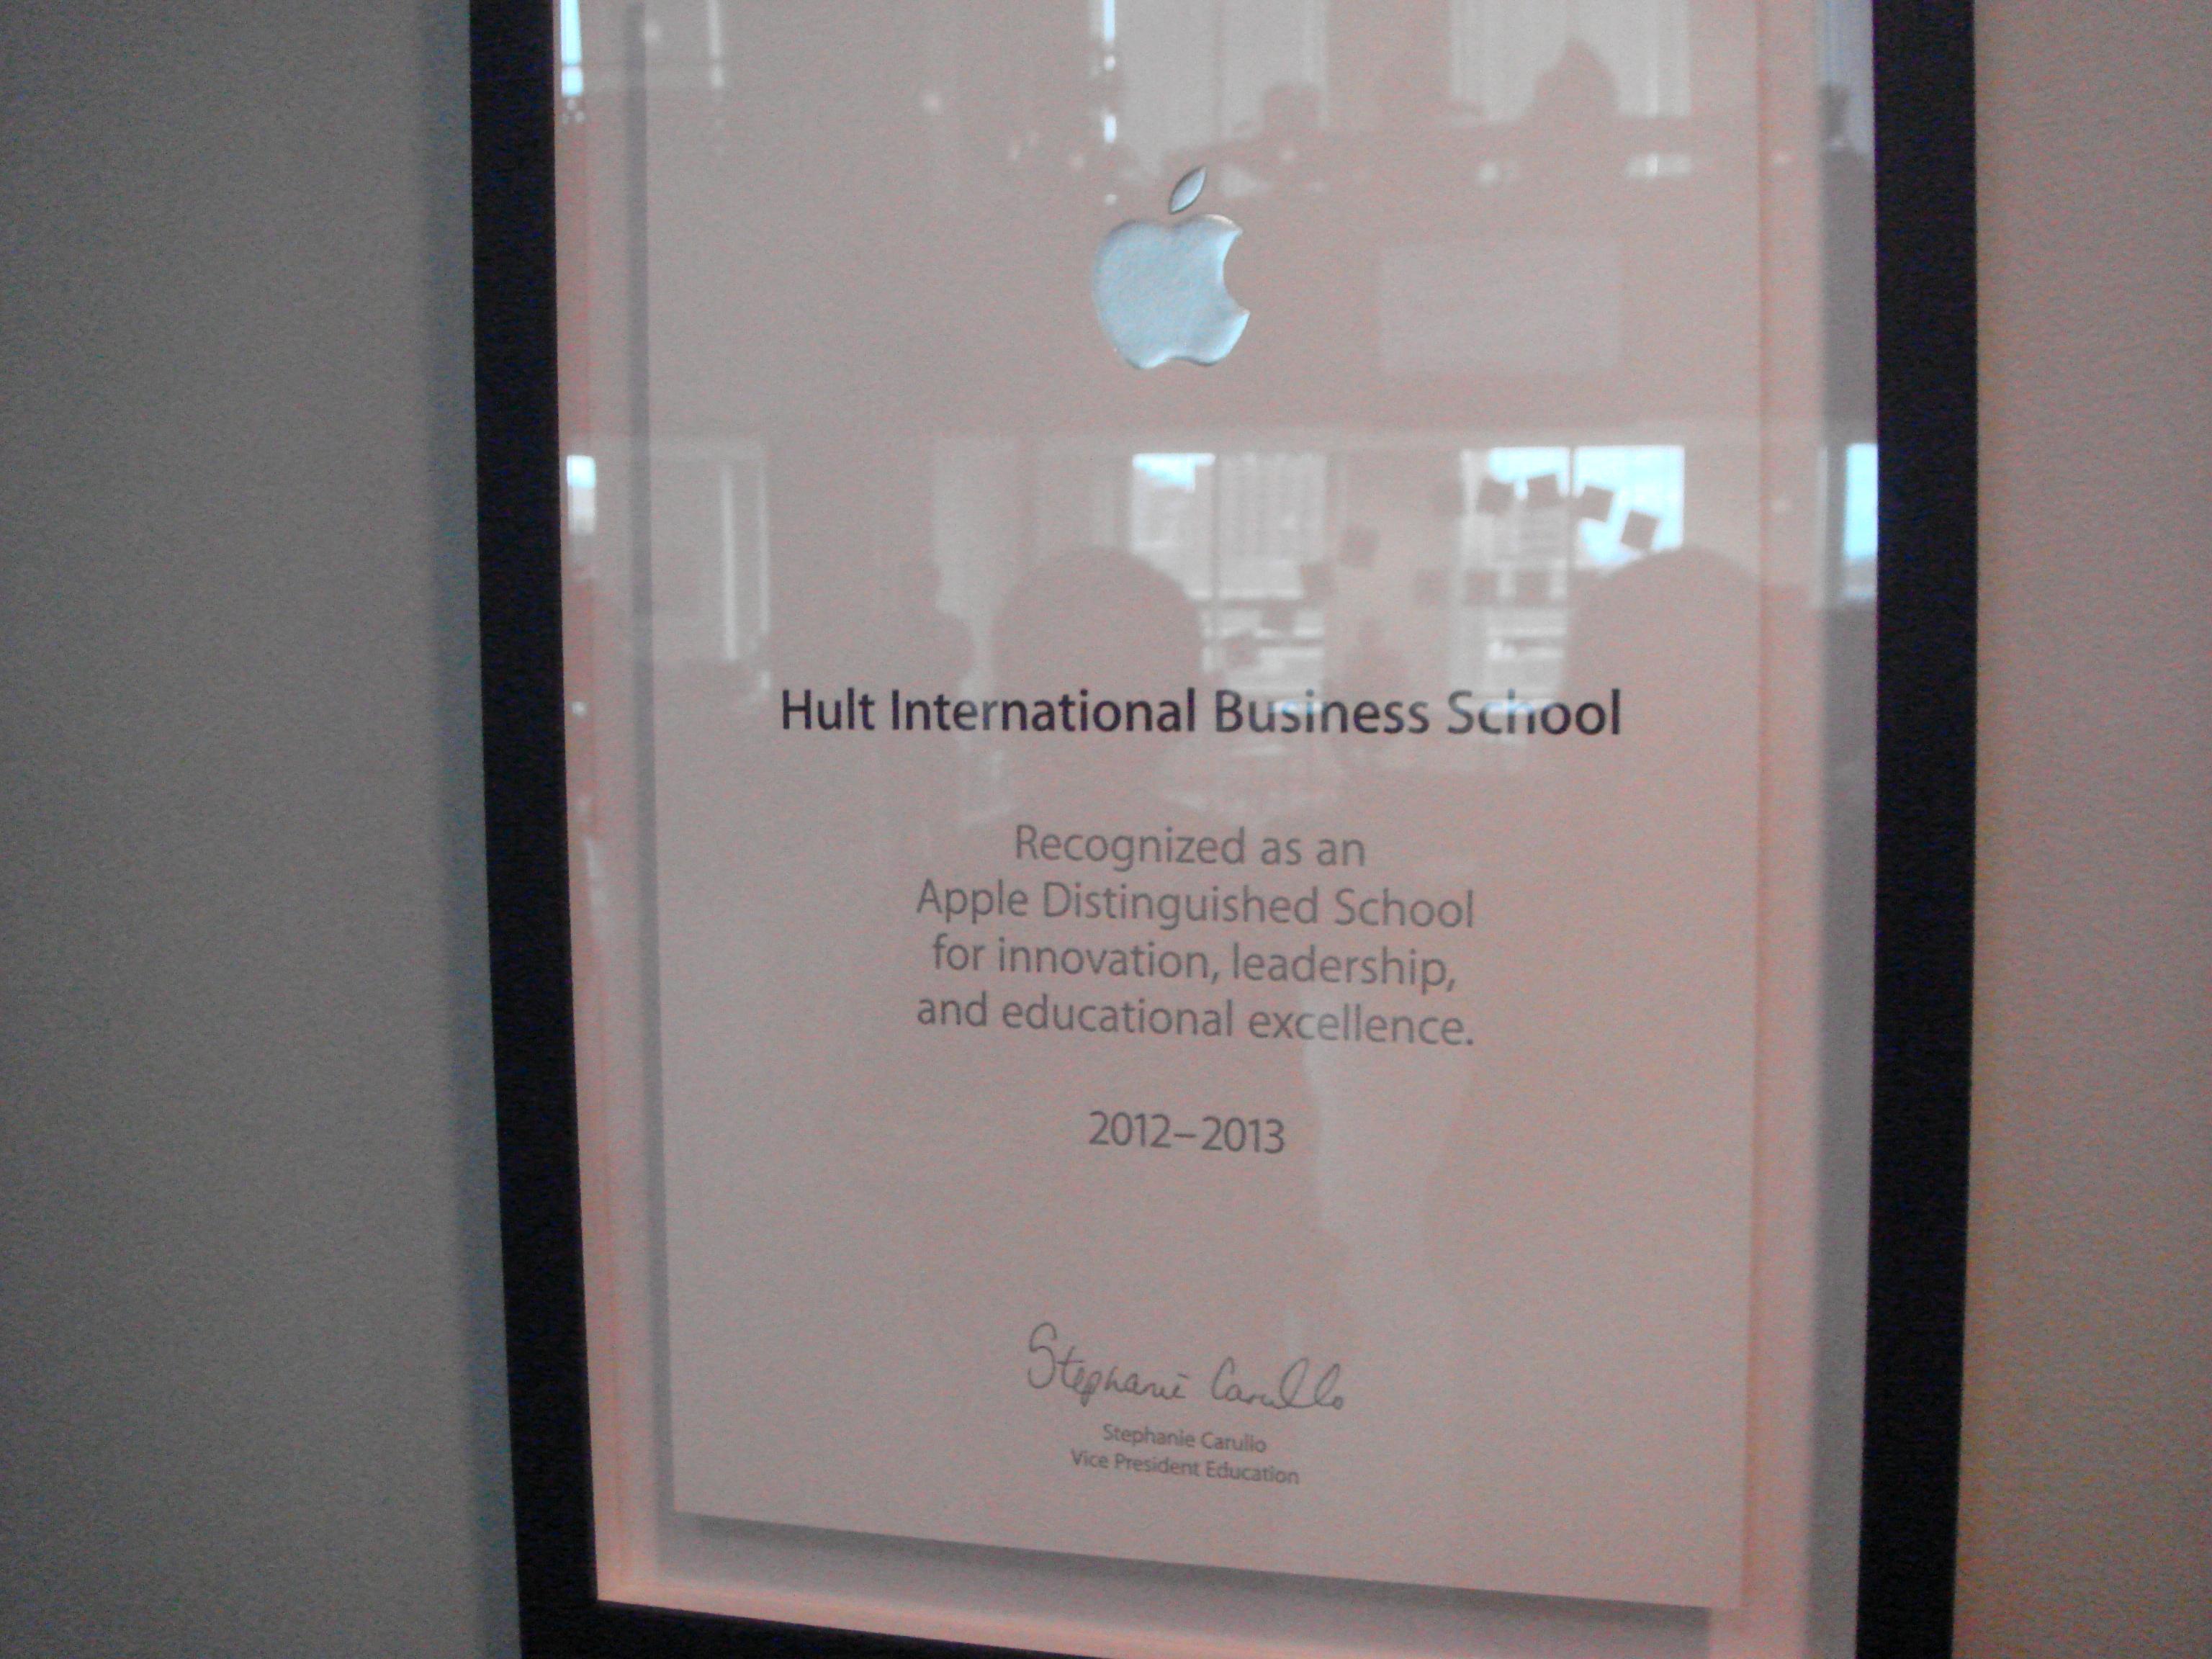 Hultはアップルから表彰を受賞